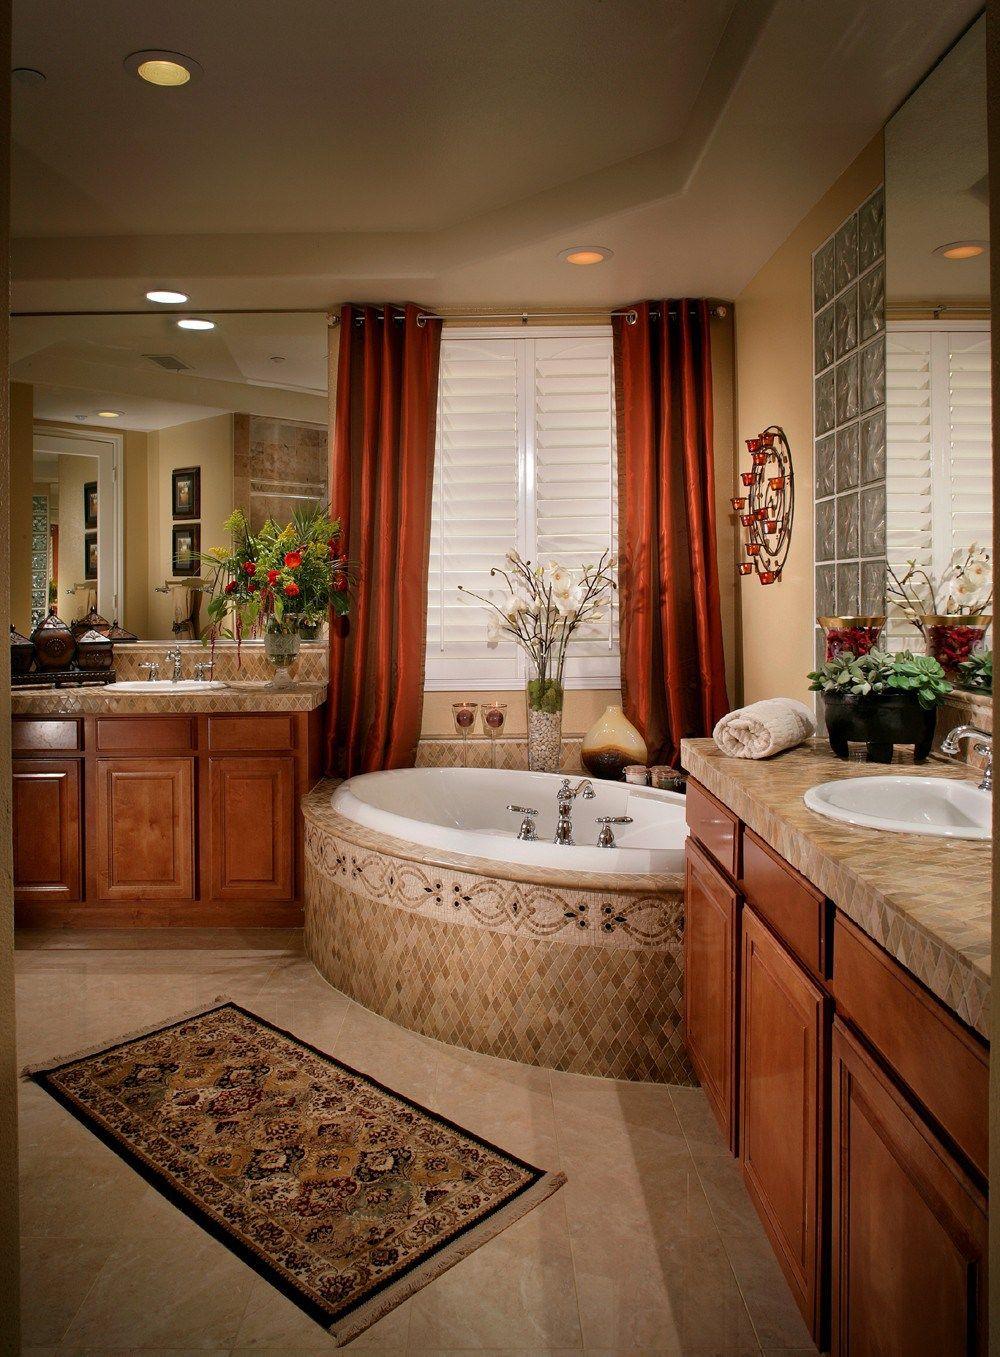 Luxurious Tuscan Bathroom Decor Ideas 1  French Country Home Beauteous Tuscan Bathroom Design Inspiration